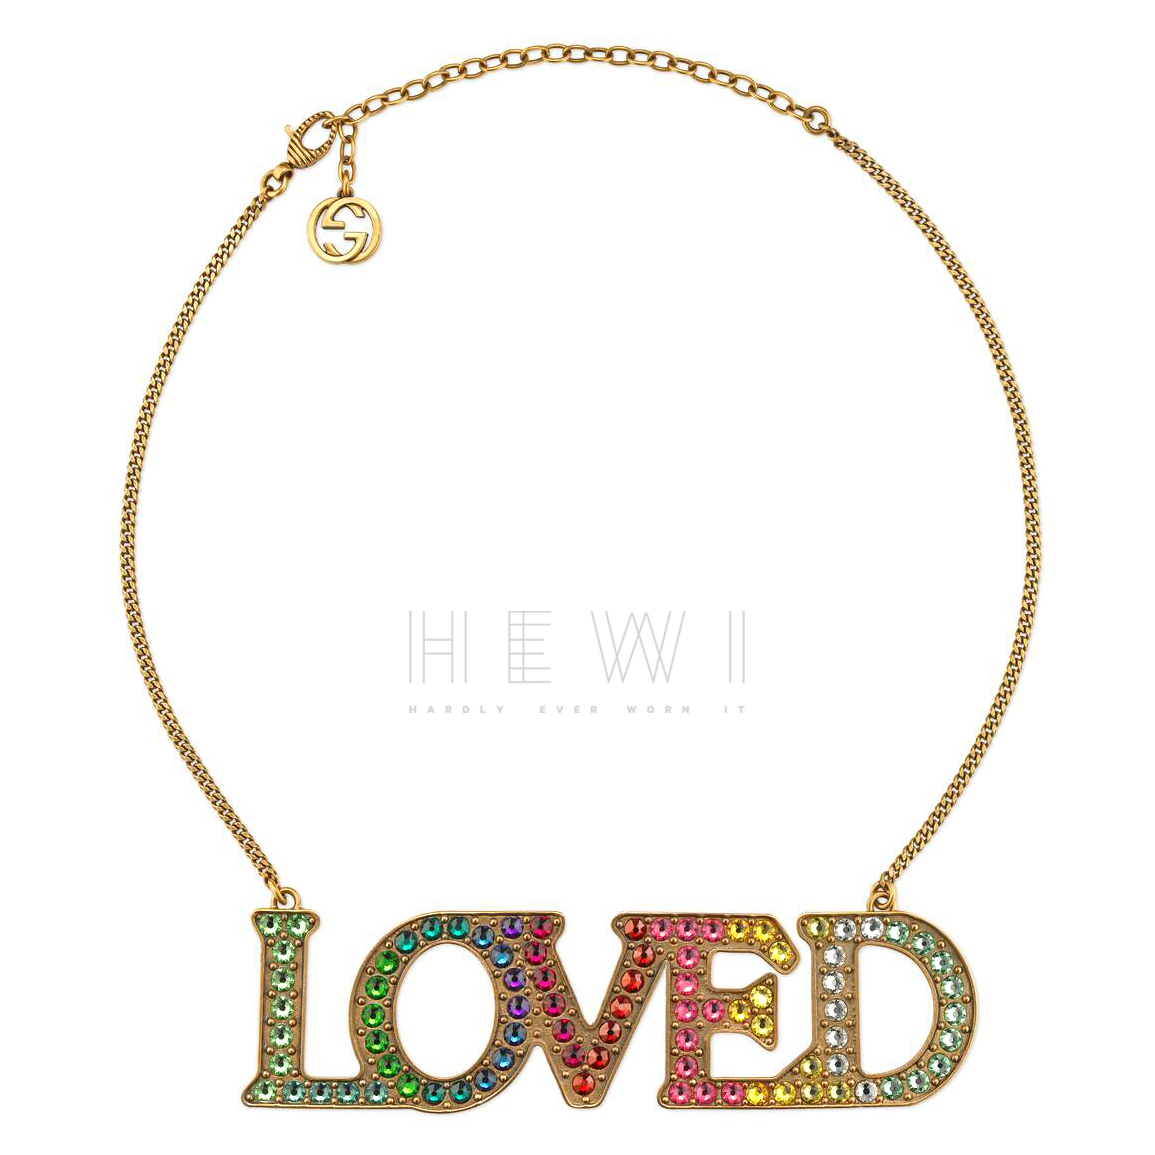 Gucci Crystal Embellished LOVED Necklace